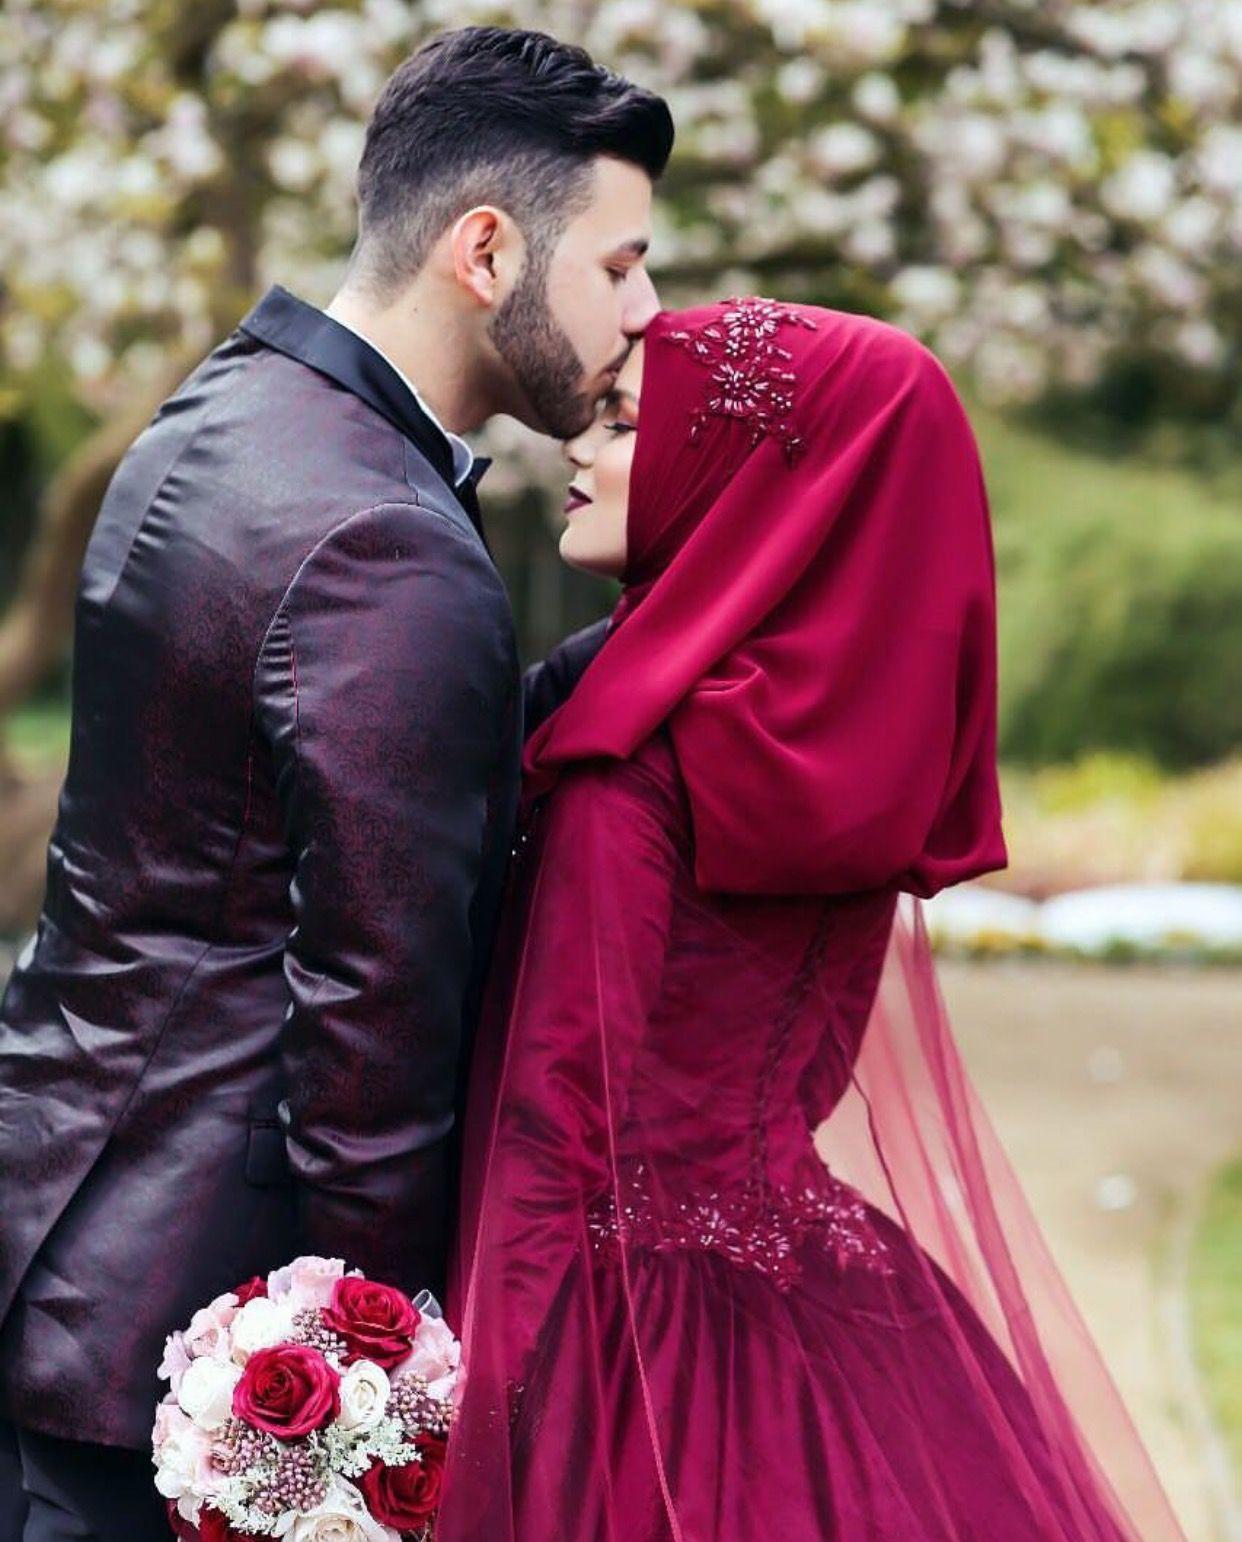 Romantic Marriage: Pinterest @adarkurdish